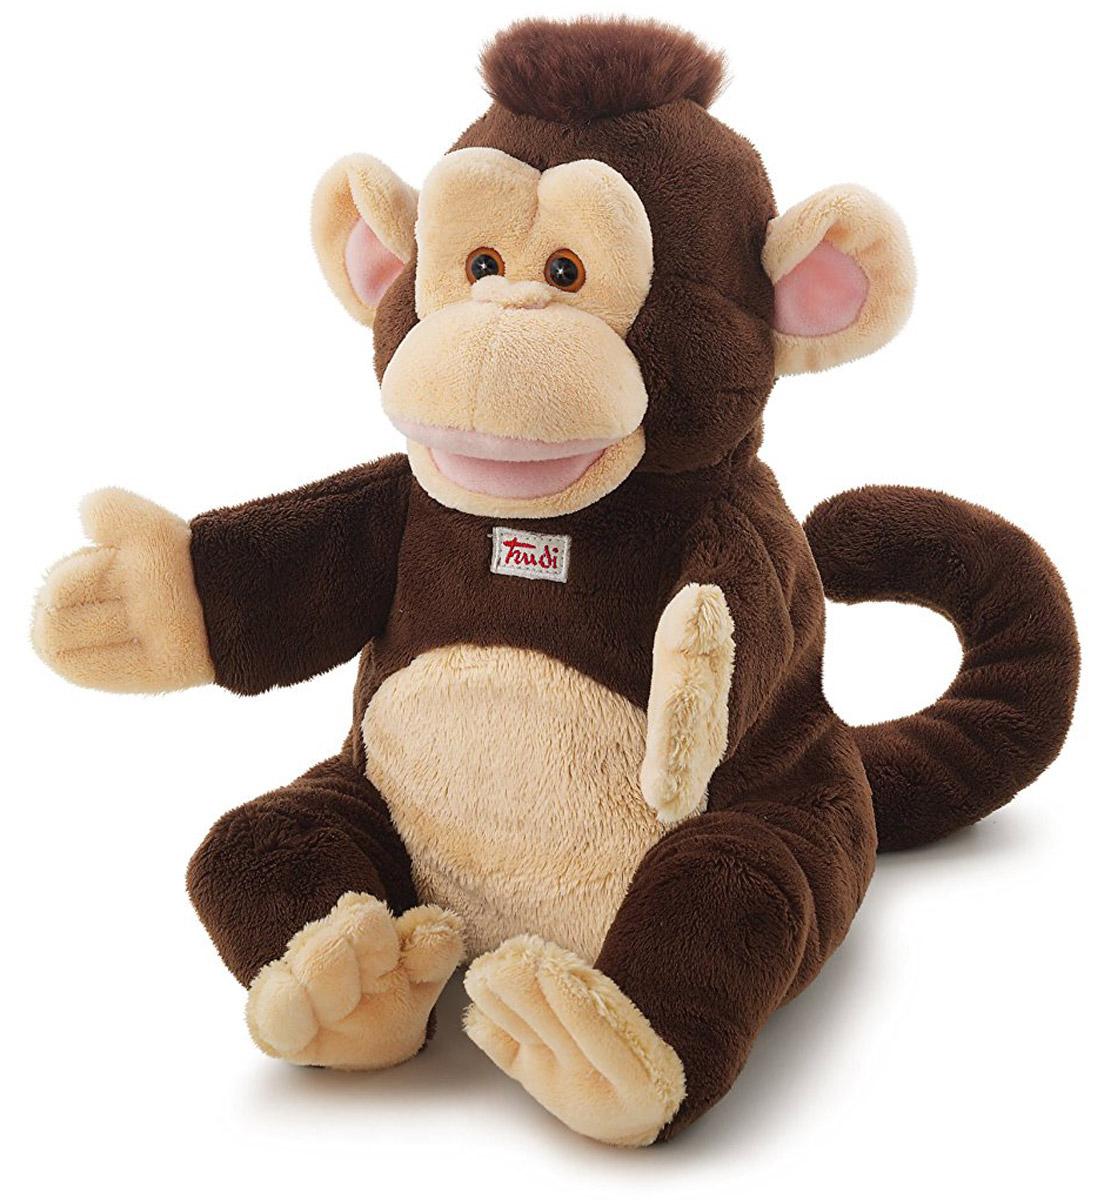 Trudi Мягкая игрушка на руку Обезьяна 25 см - Мягкие игрушки